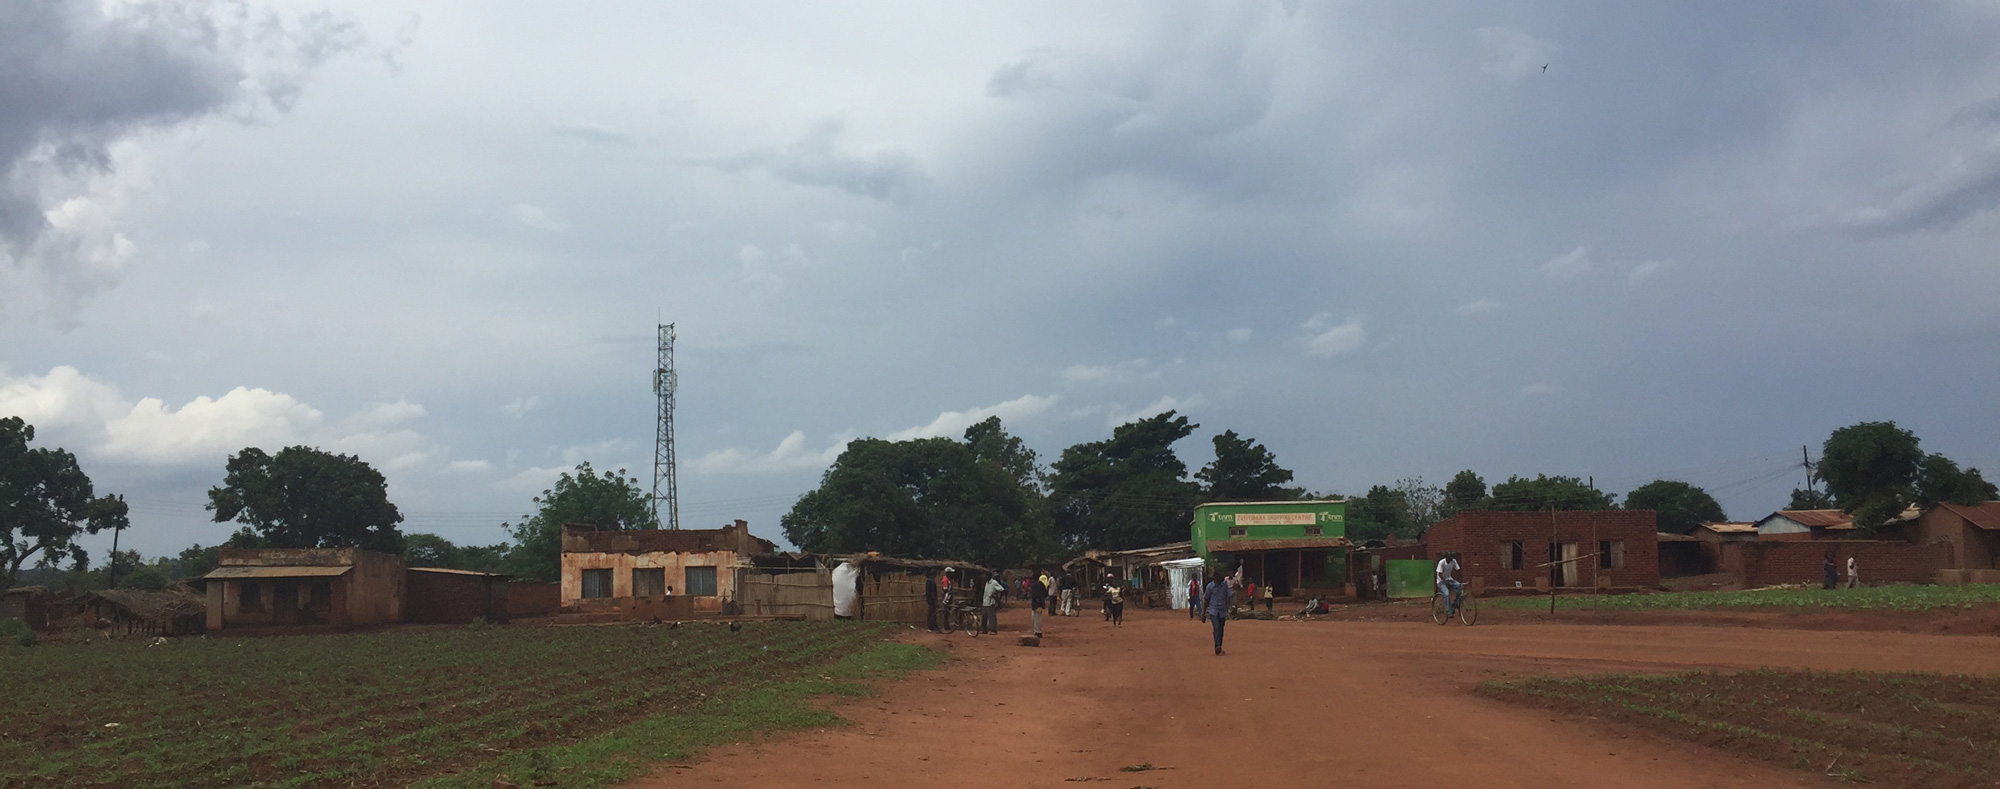 Malawi-Landscape-02